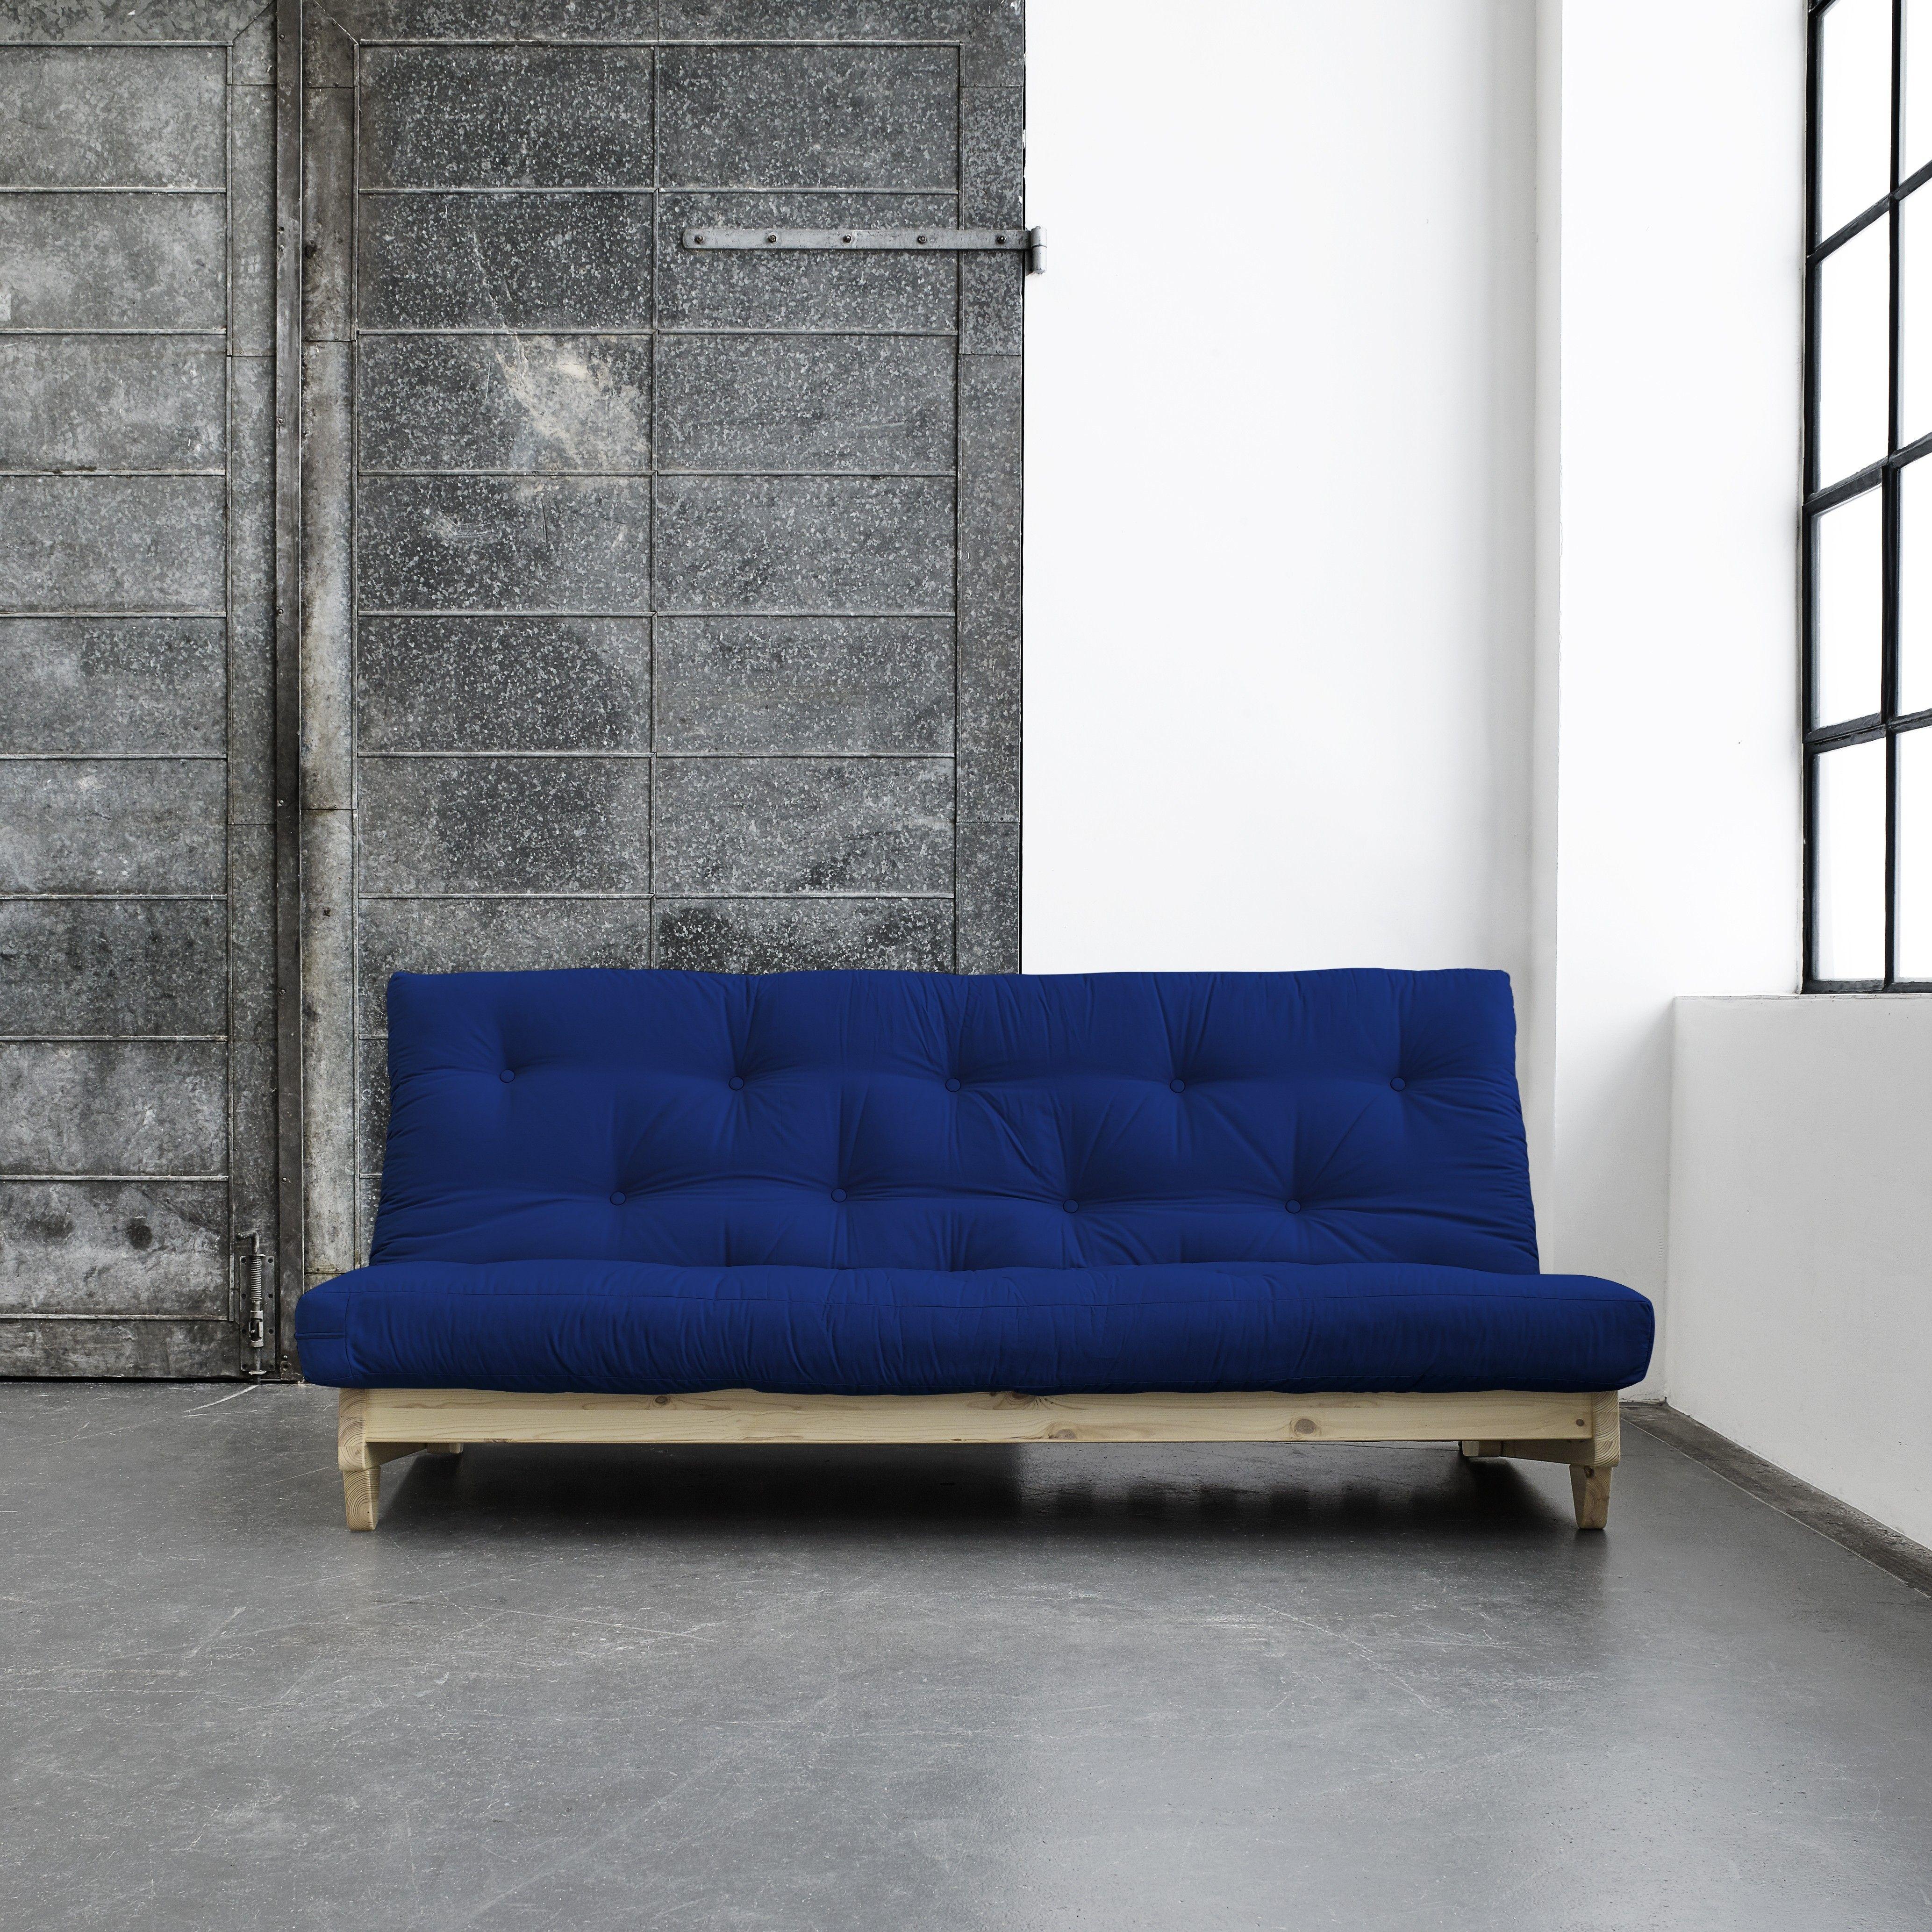 Karup Fresh Royal 743. Buy now at https://www.moebel-wohnbar.de ...